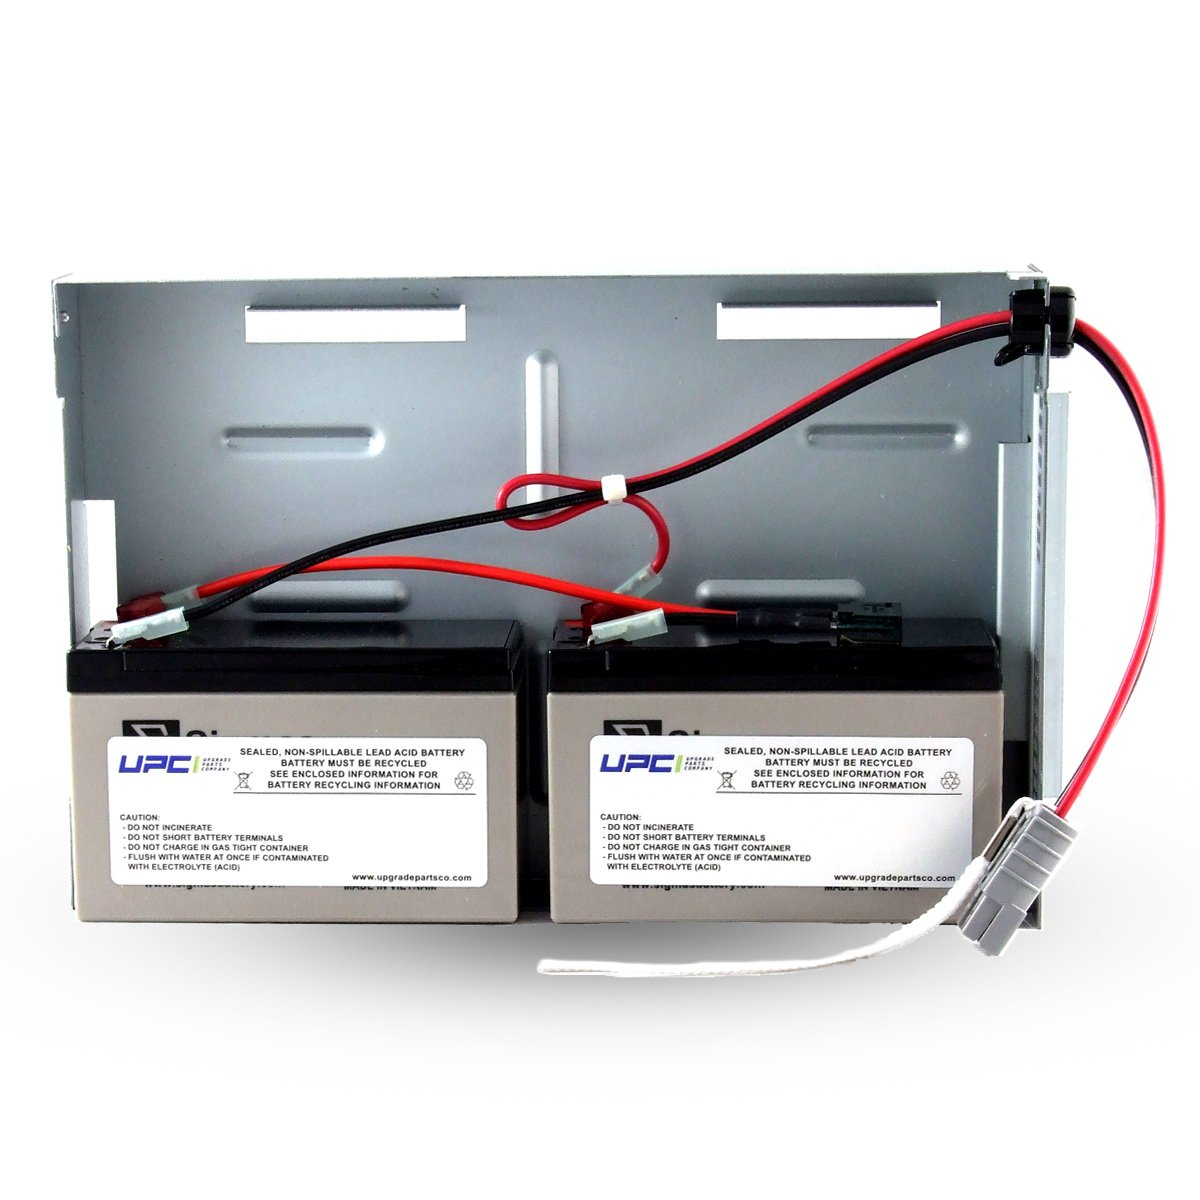 UPC RBC22 Replacement Battery Cartridge